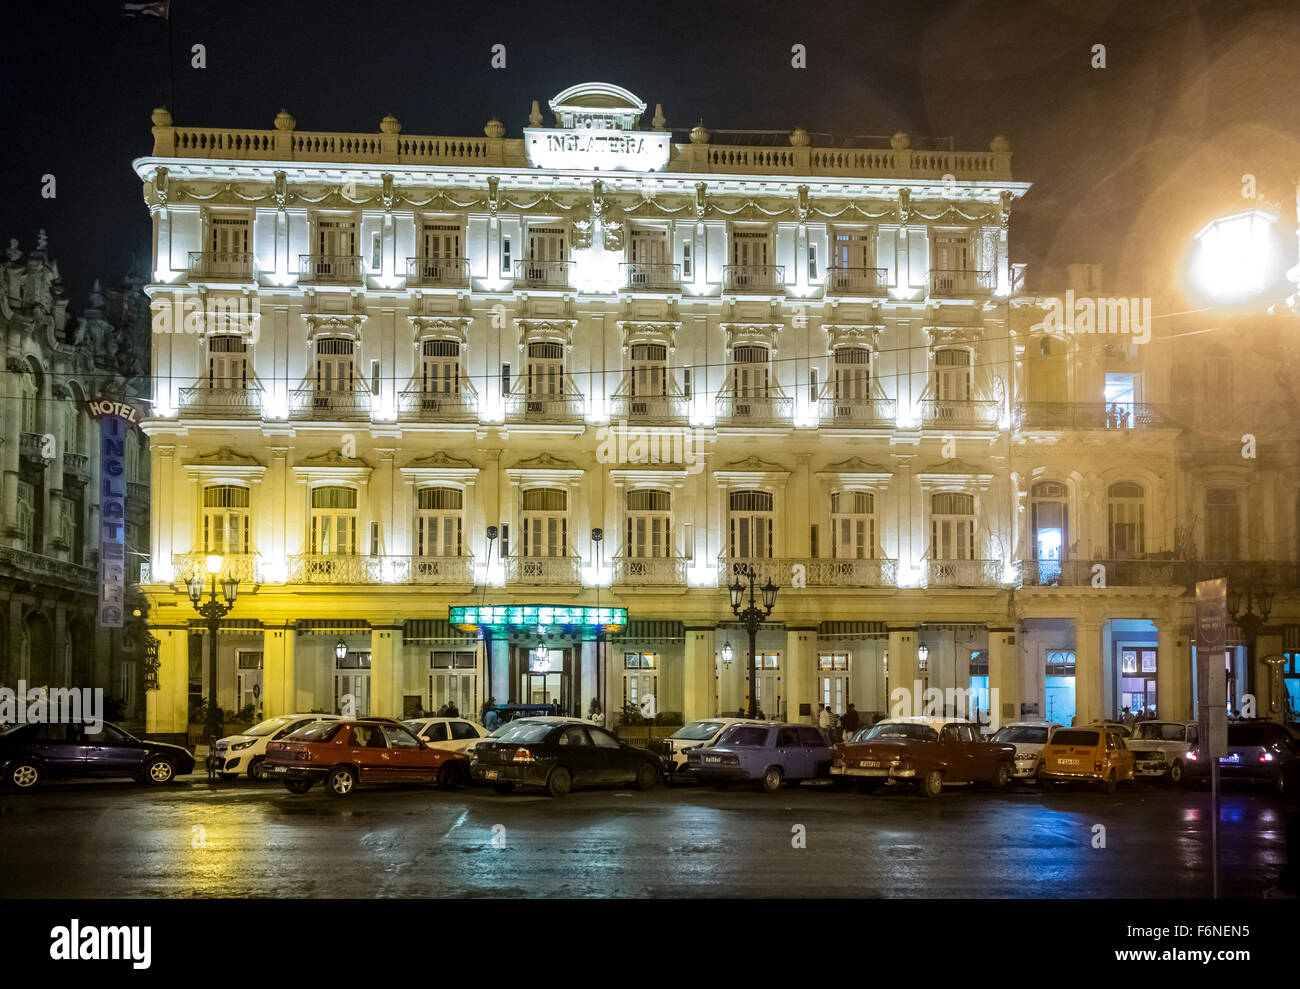 Hotel Inglaterra at night, in the rain Havana, Cuba, North America, Caribbean, Havana - Stock Image